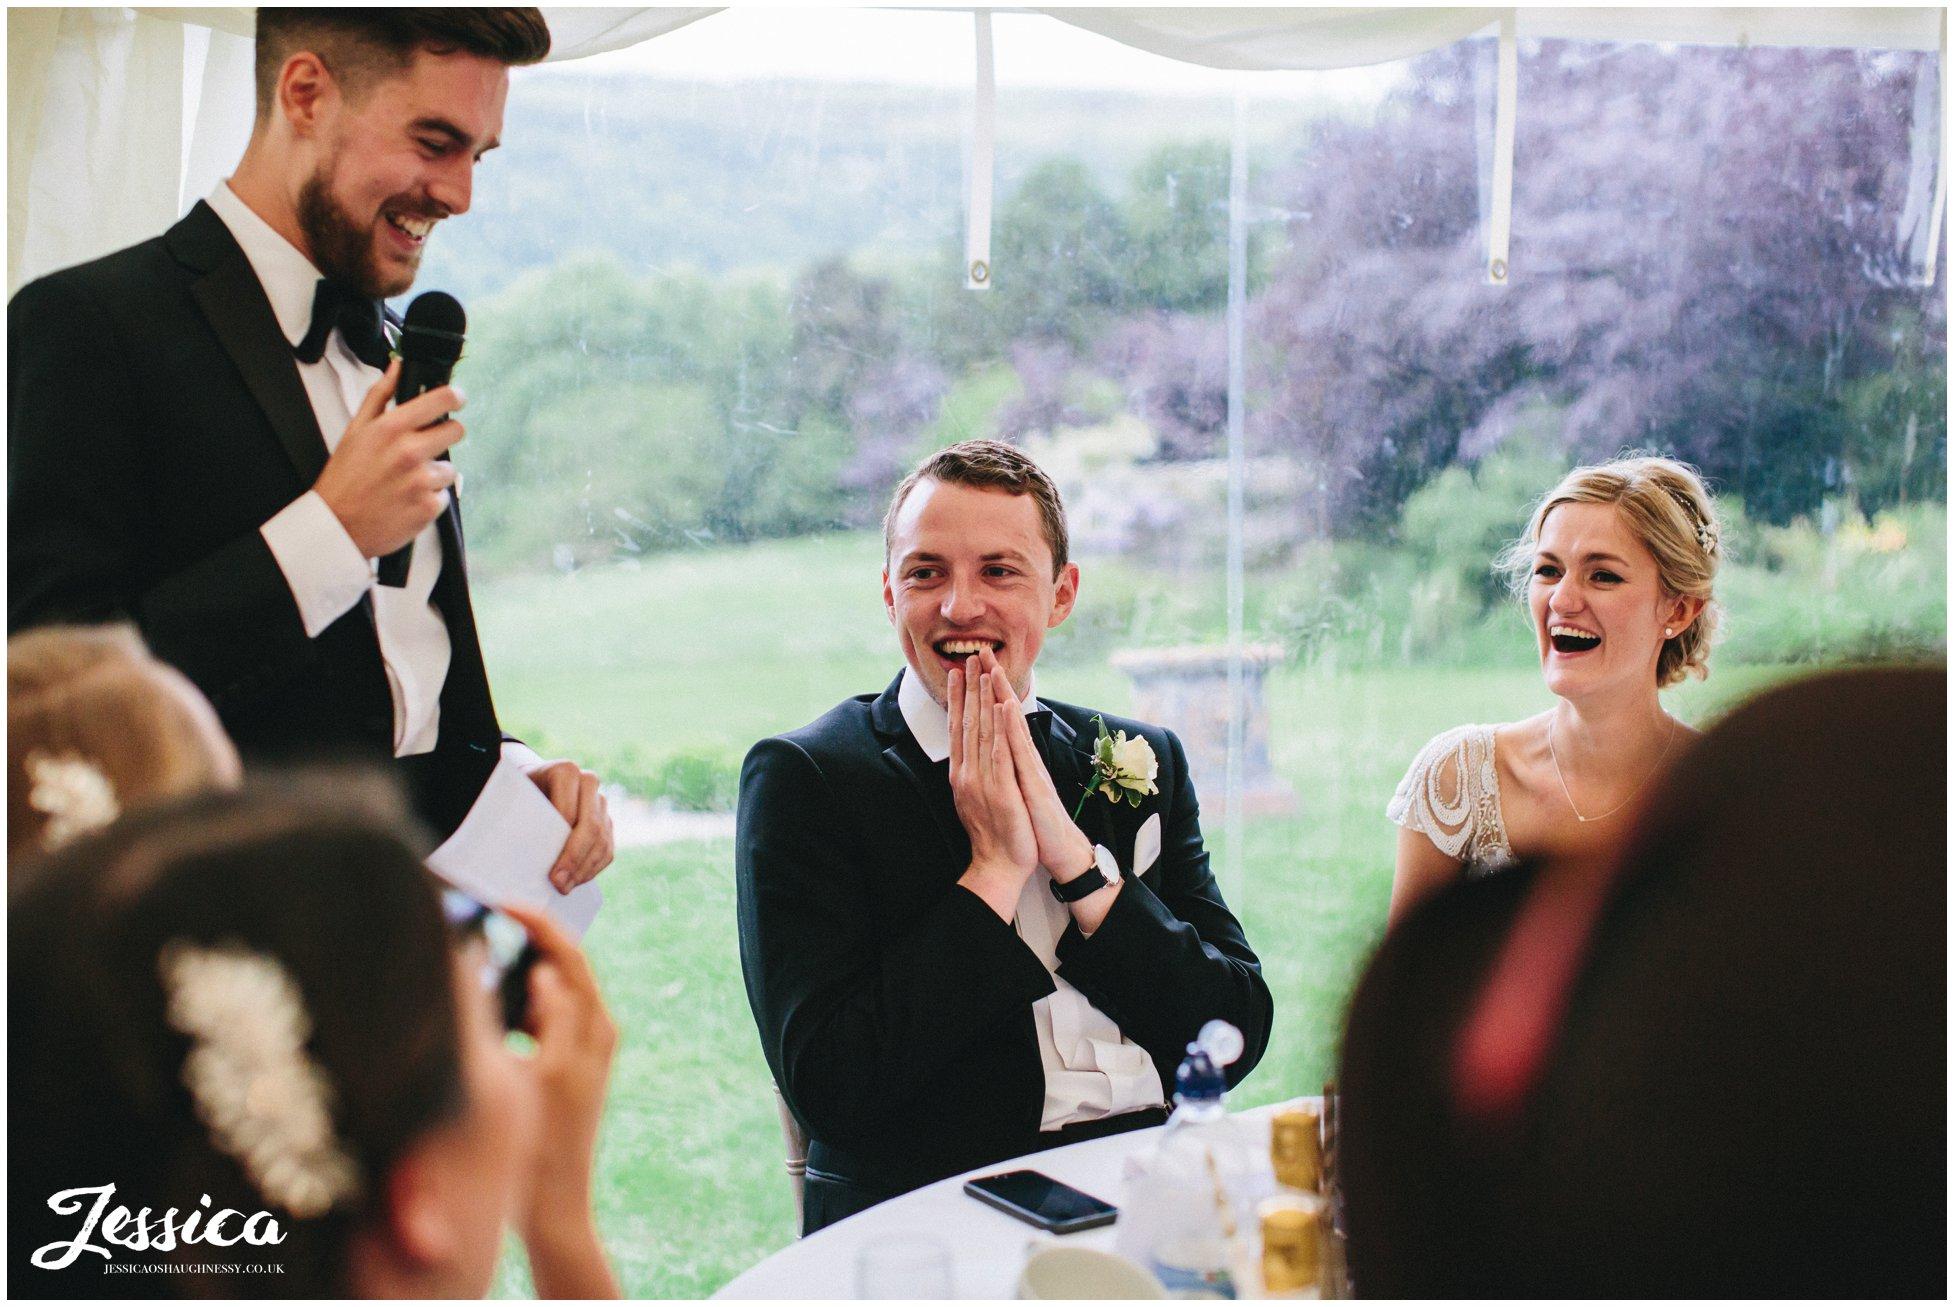 groom looks shocked during the best man's speech